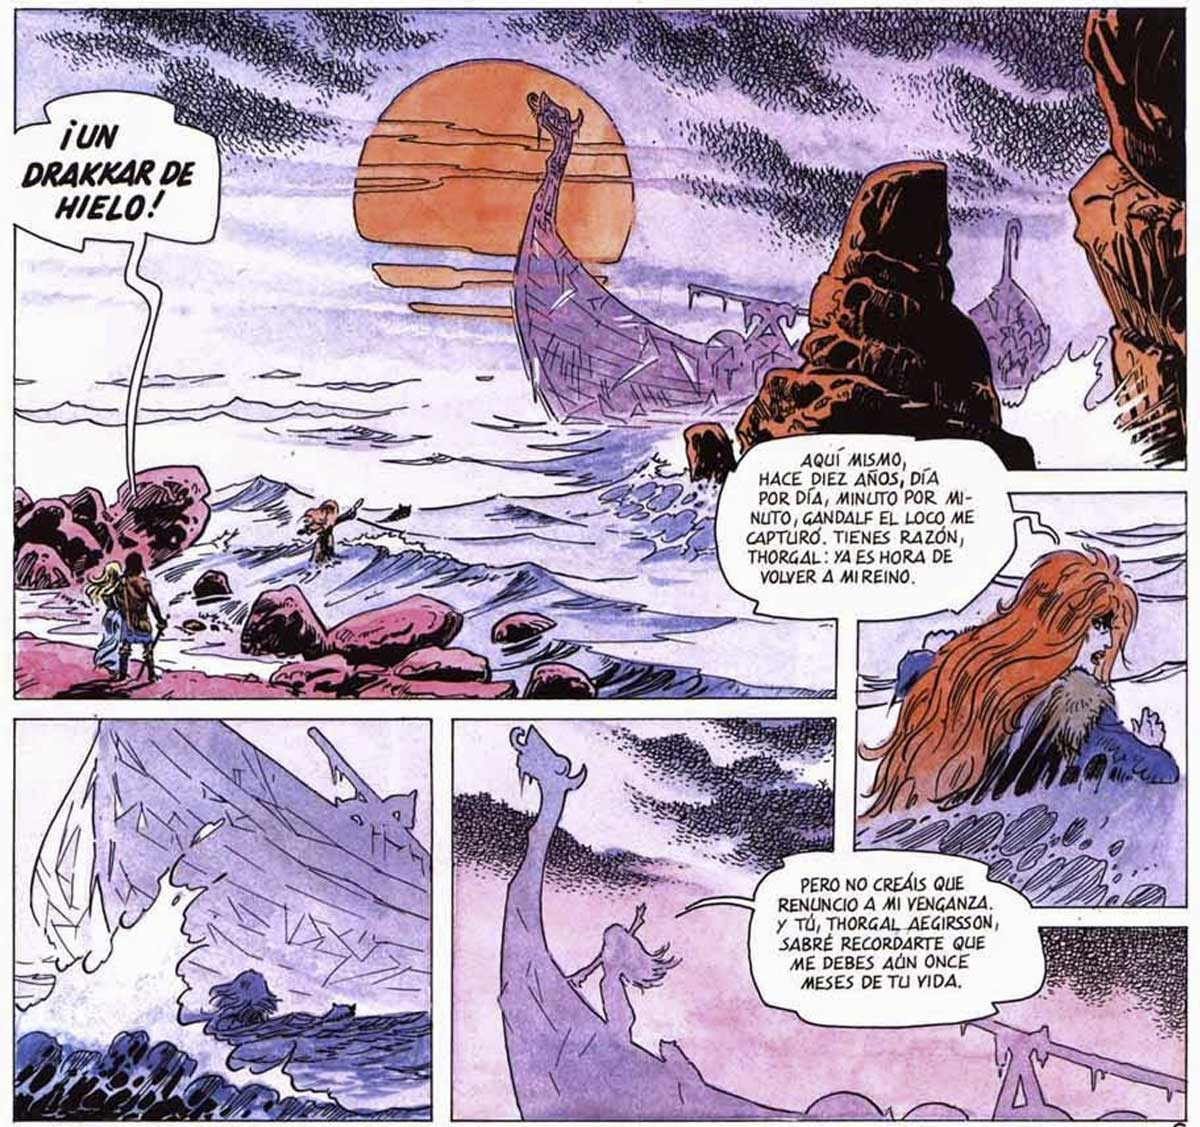 Golem-comics-resena-Thorgal-van-hamme-rosinski-04